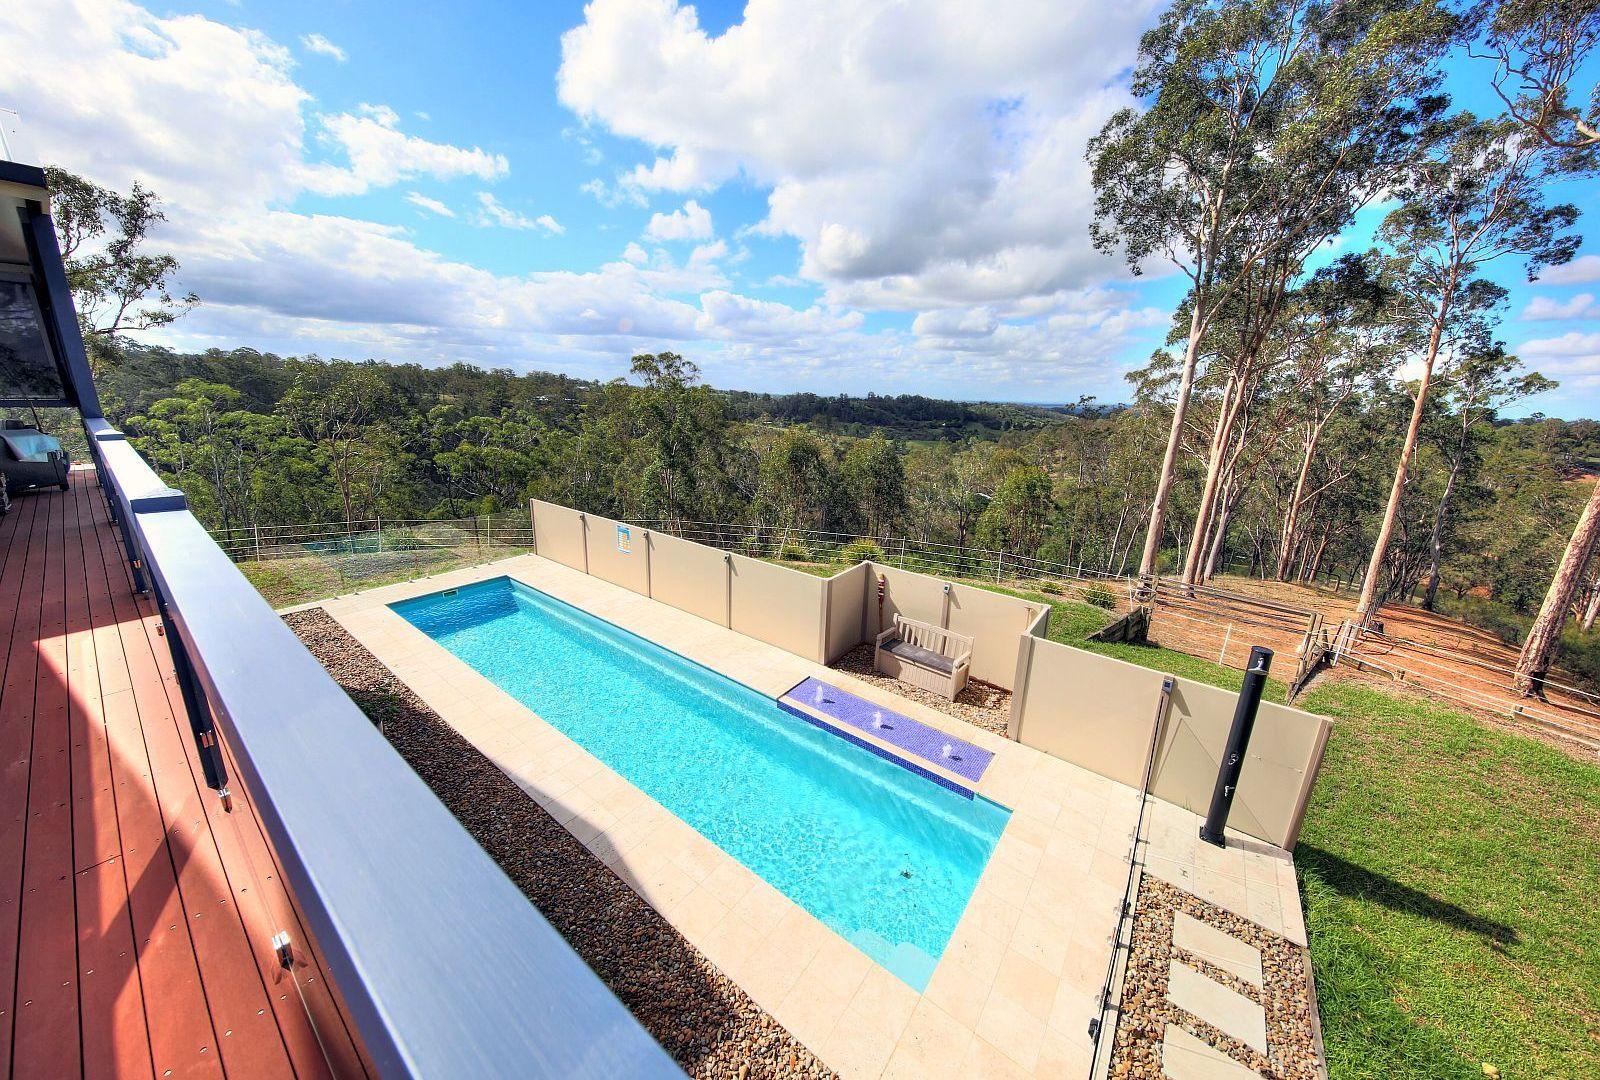 203 Garlicks Range Rd, Orangeville NSW 2570, Image 1